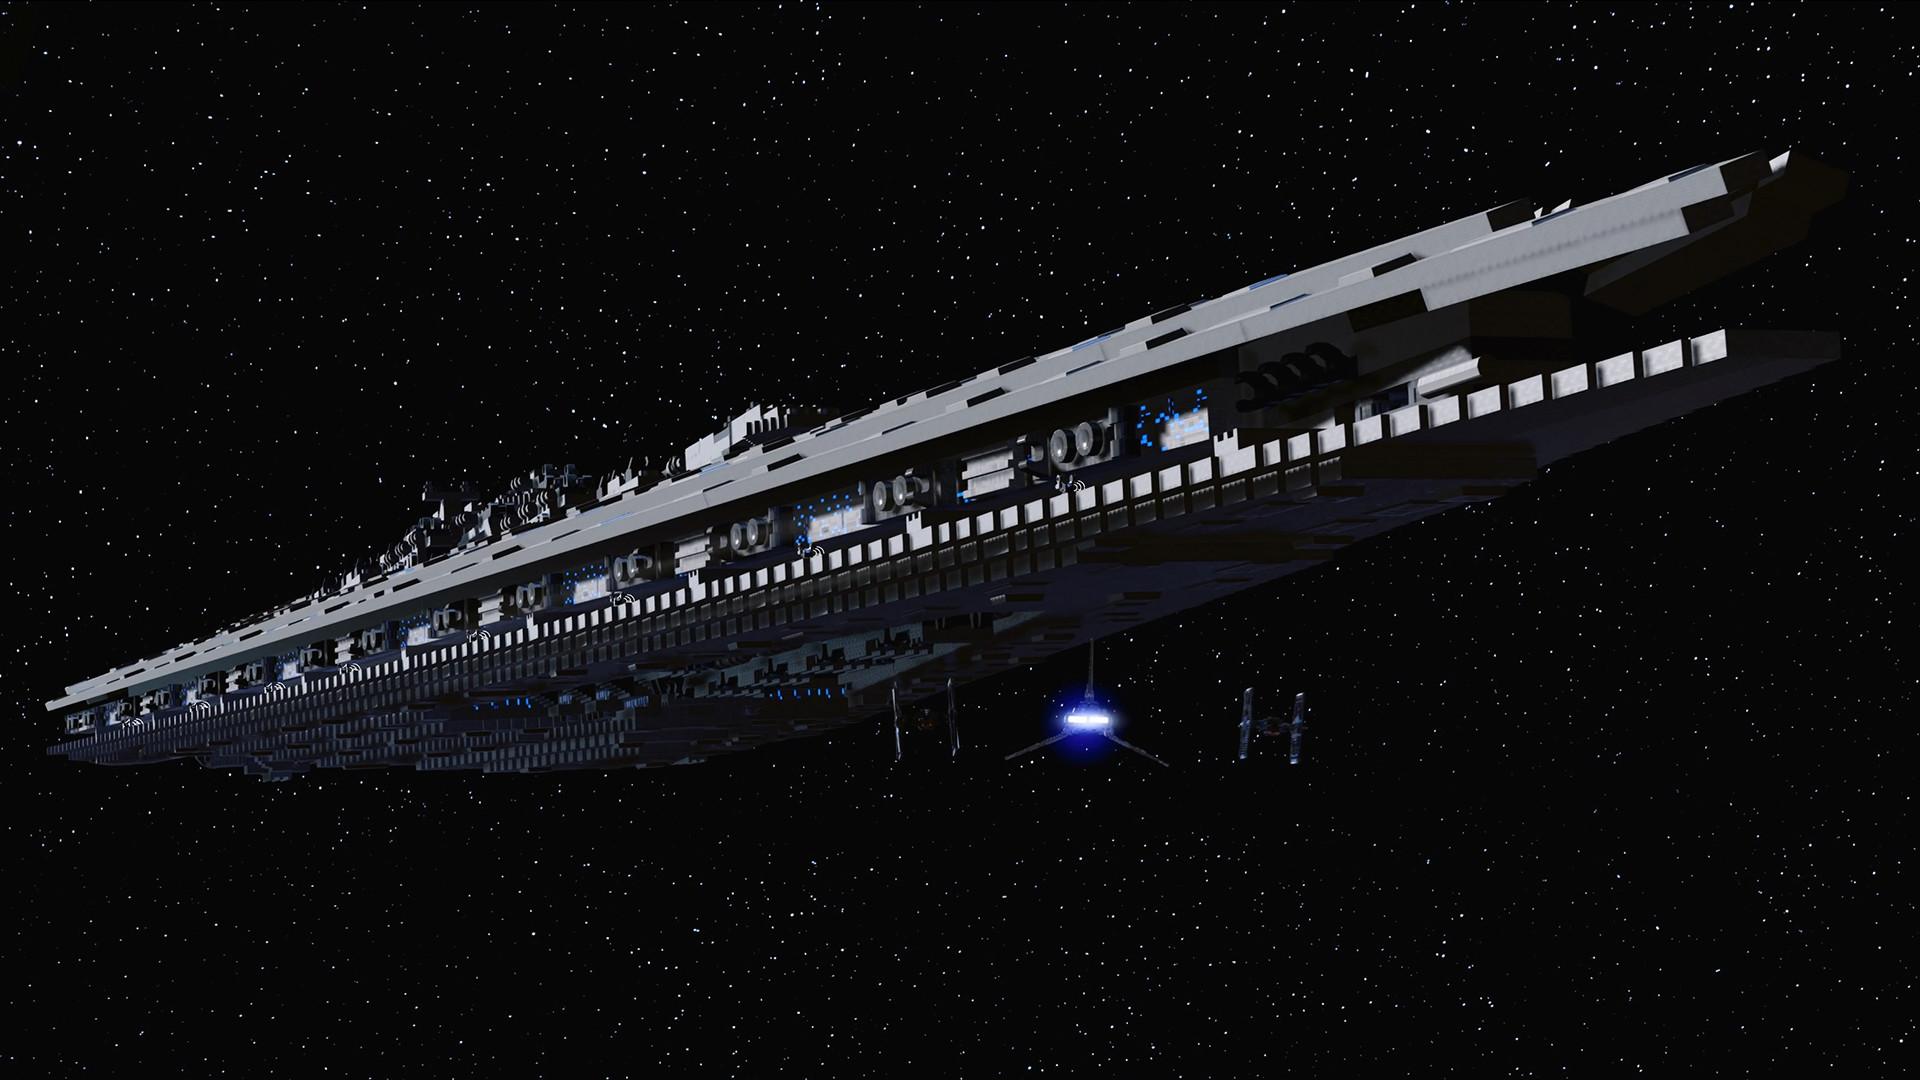 Lego Star Wars The Skywalker Saga On Steam